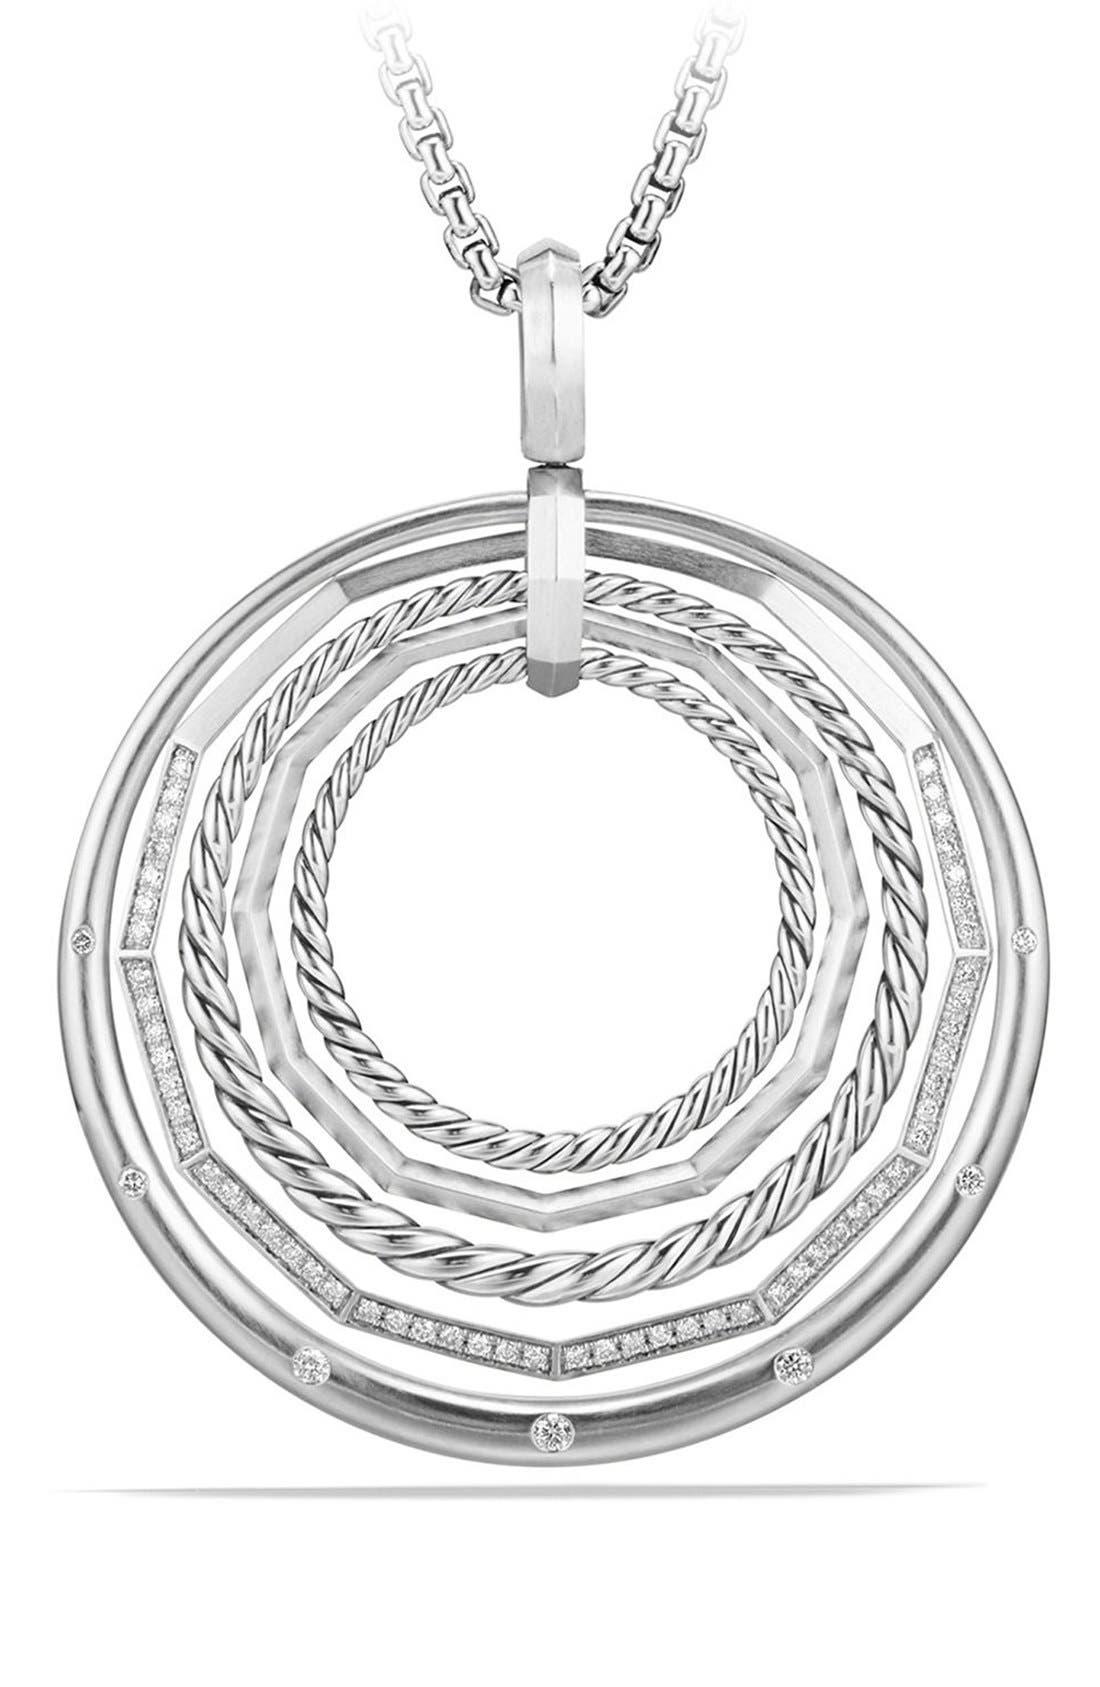 DAVID YURMAN Stax Large Pendant Necklace with Diamonds